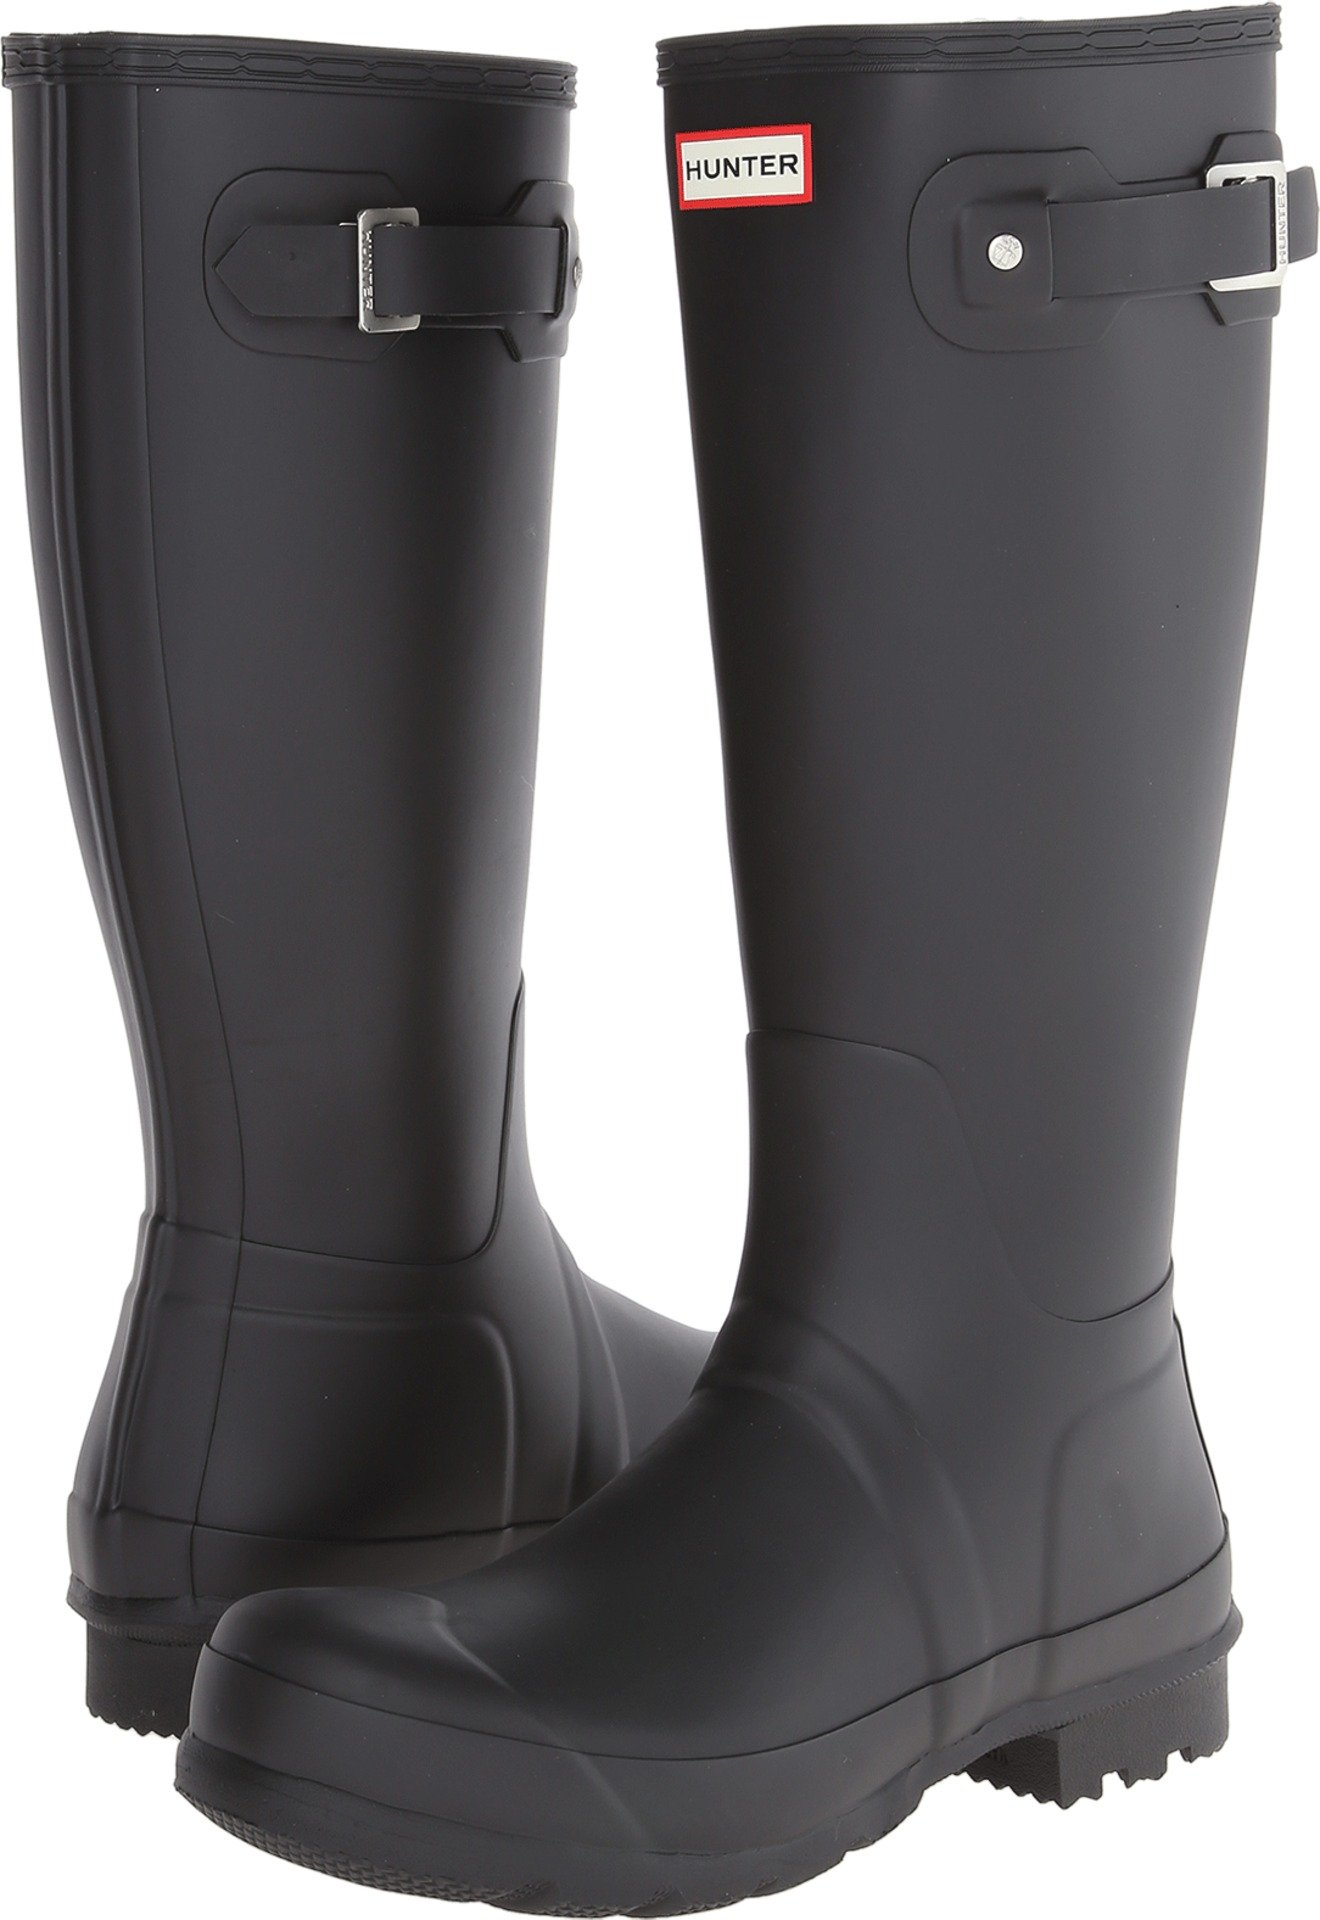 Hunter Men's Original Tall Rain Boots Black 8 M US by Hunter (Image #1)